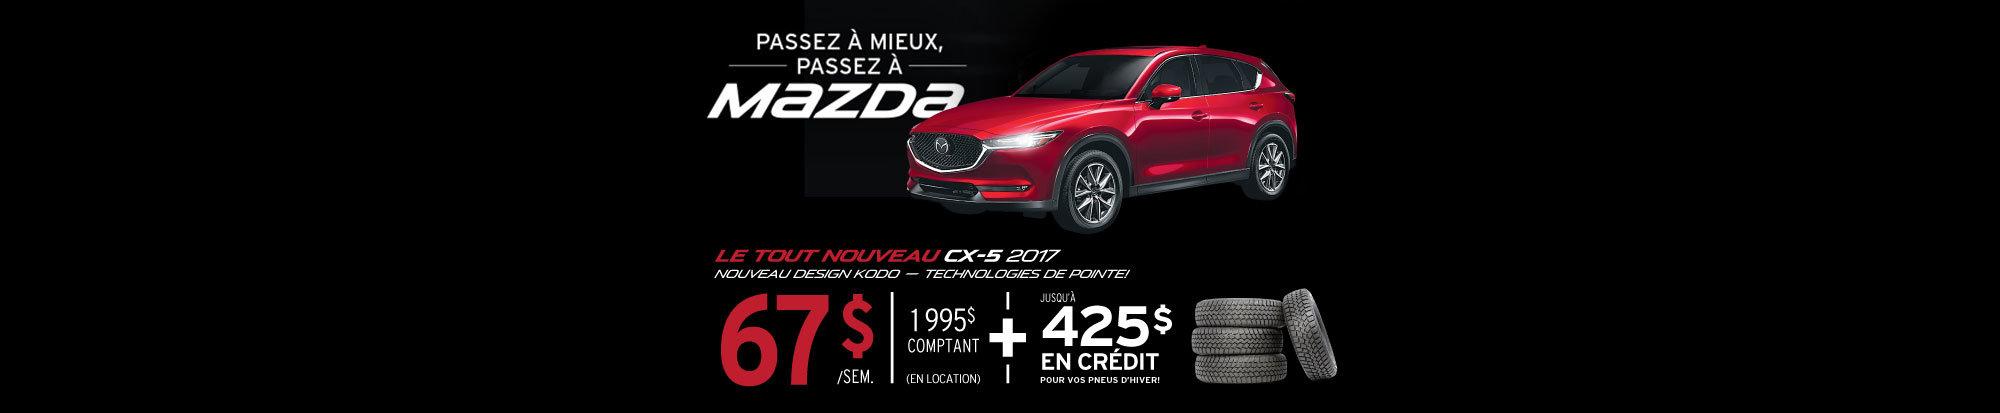 Mazda CX-5 2017 web